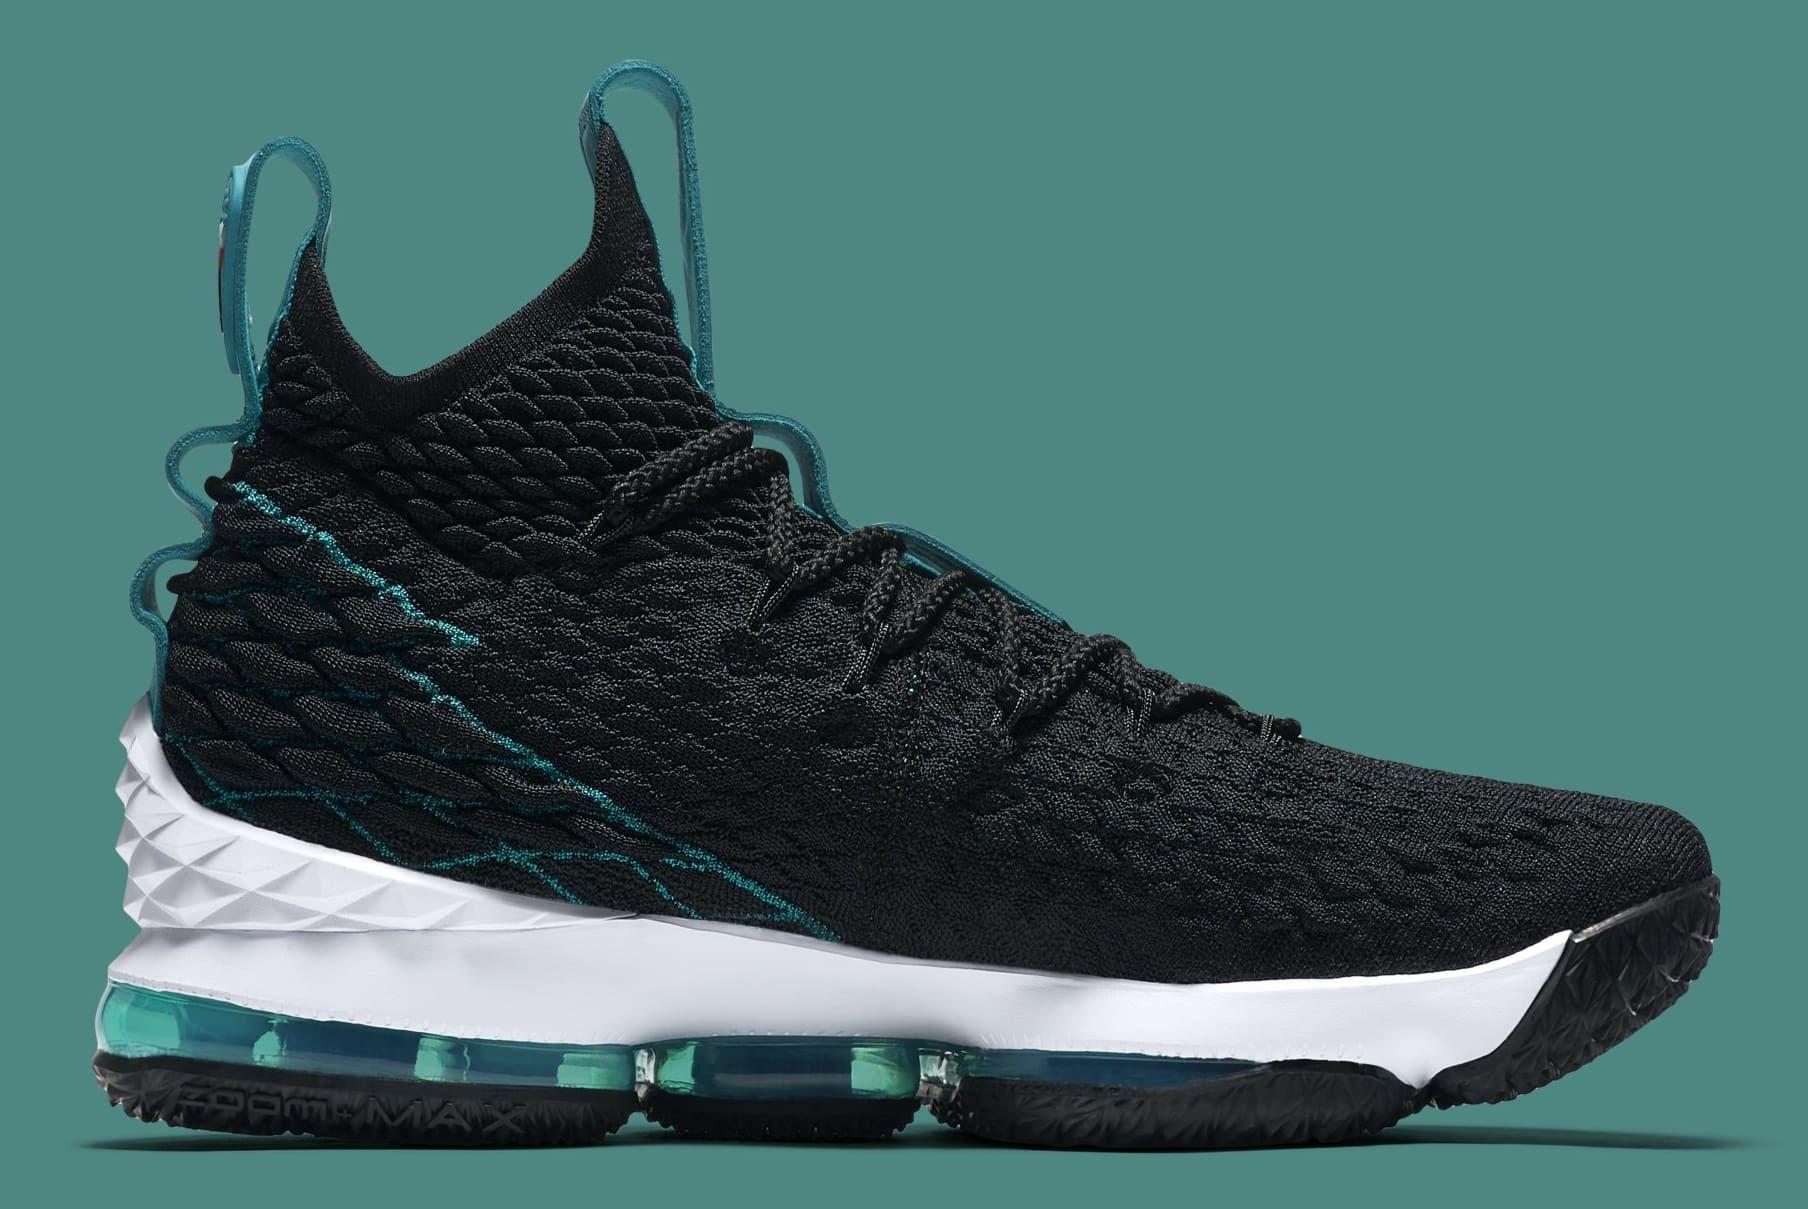 timeless design 3f4be 30c00 Nike LeBron XV